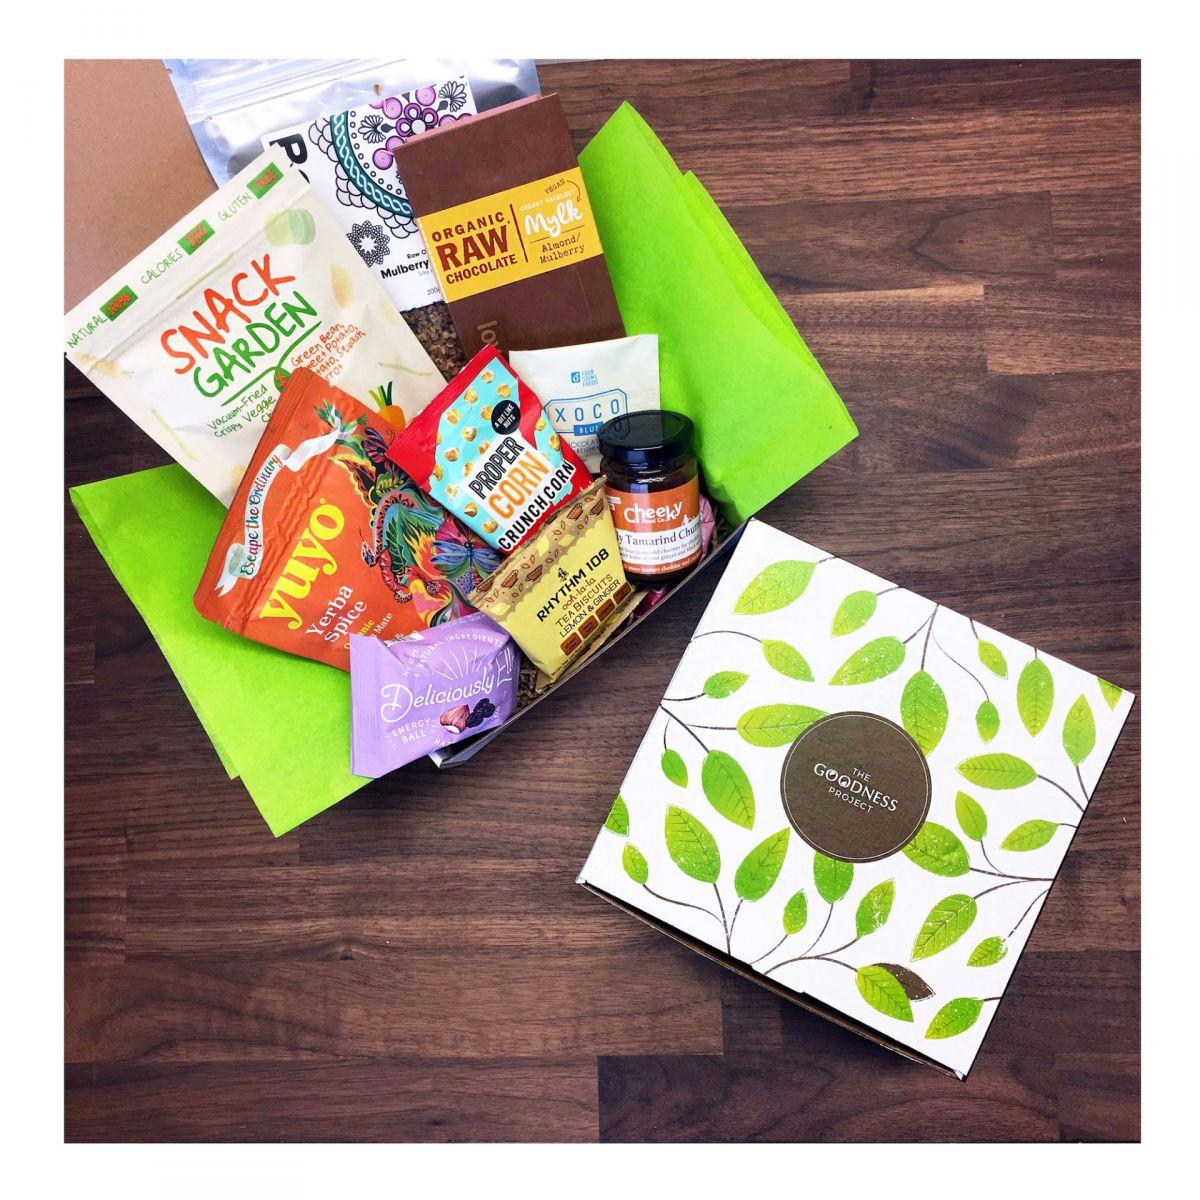 vegan-healthy-glutenfree-subscription-boxes